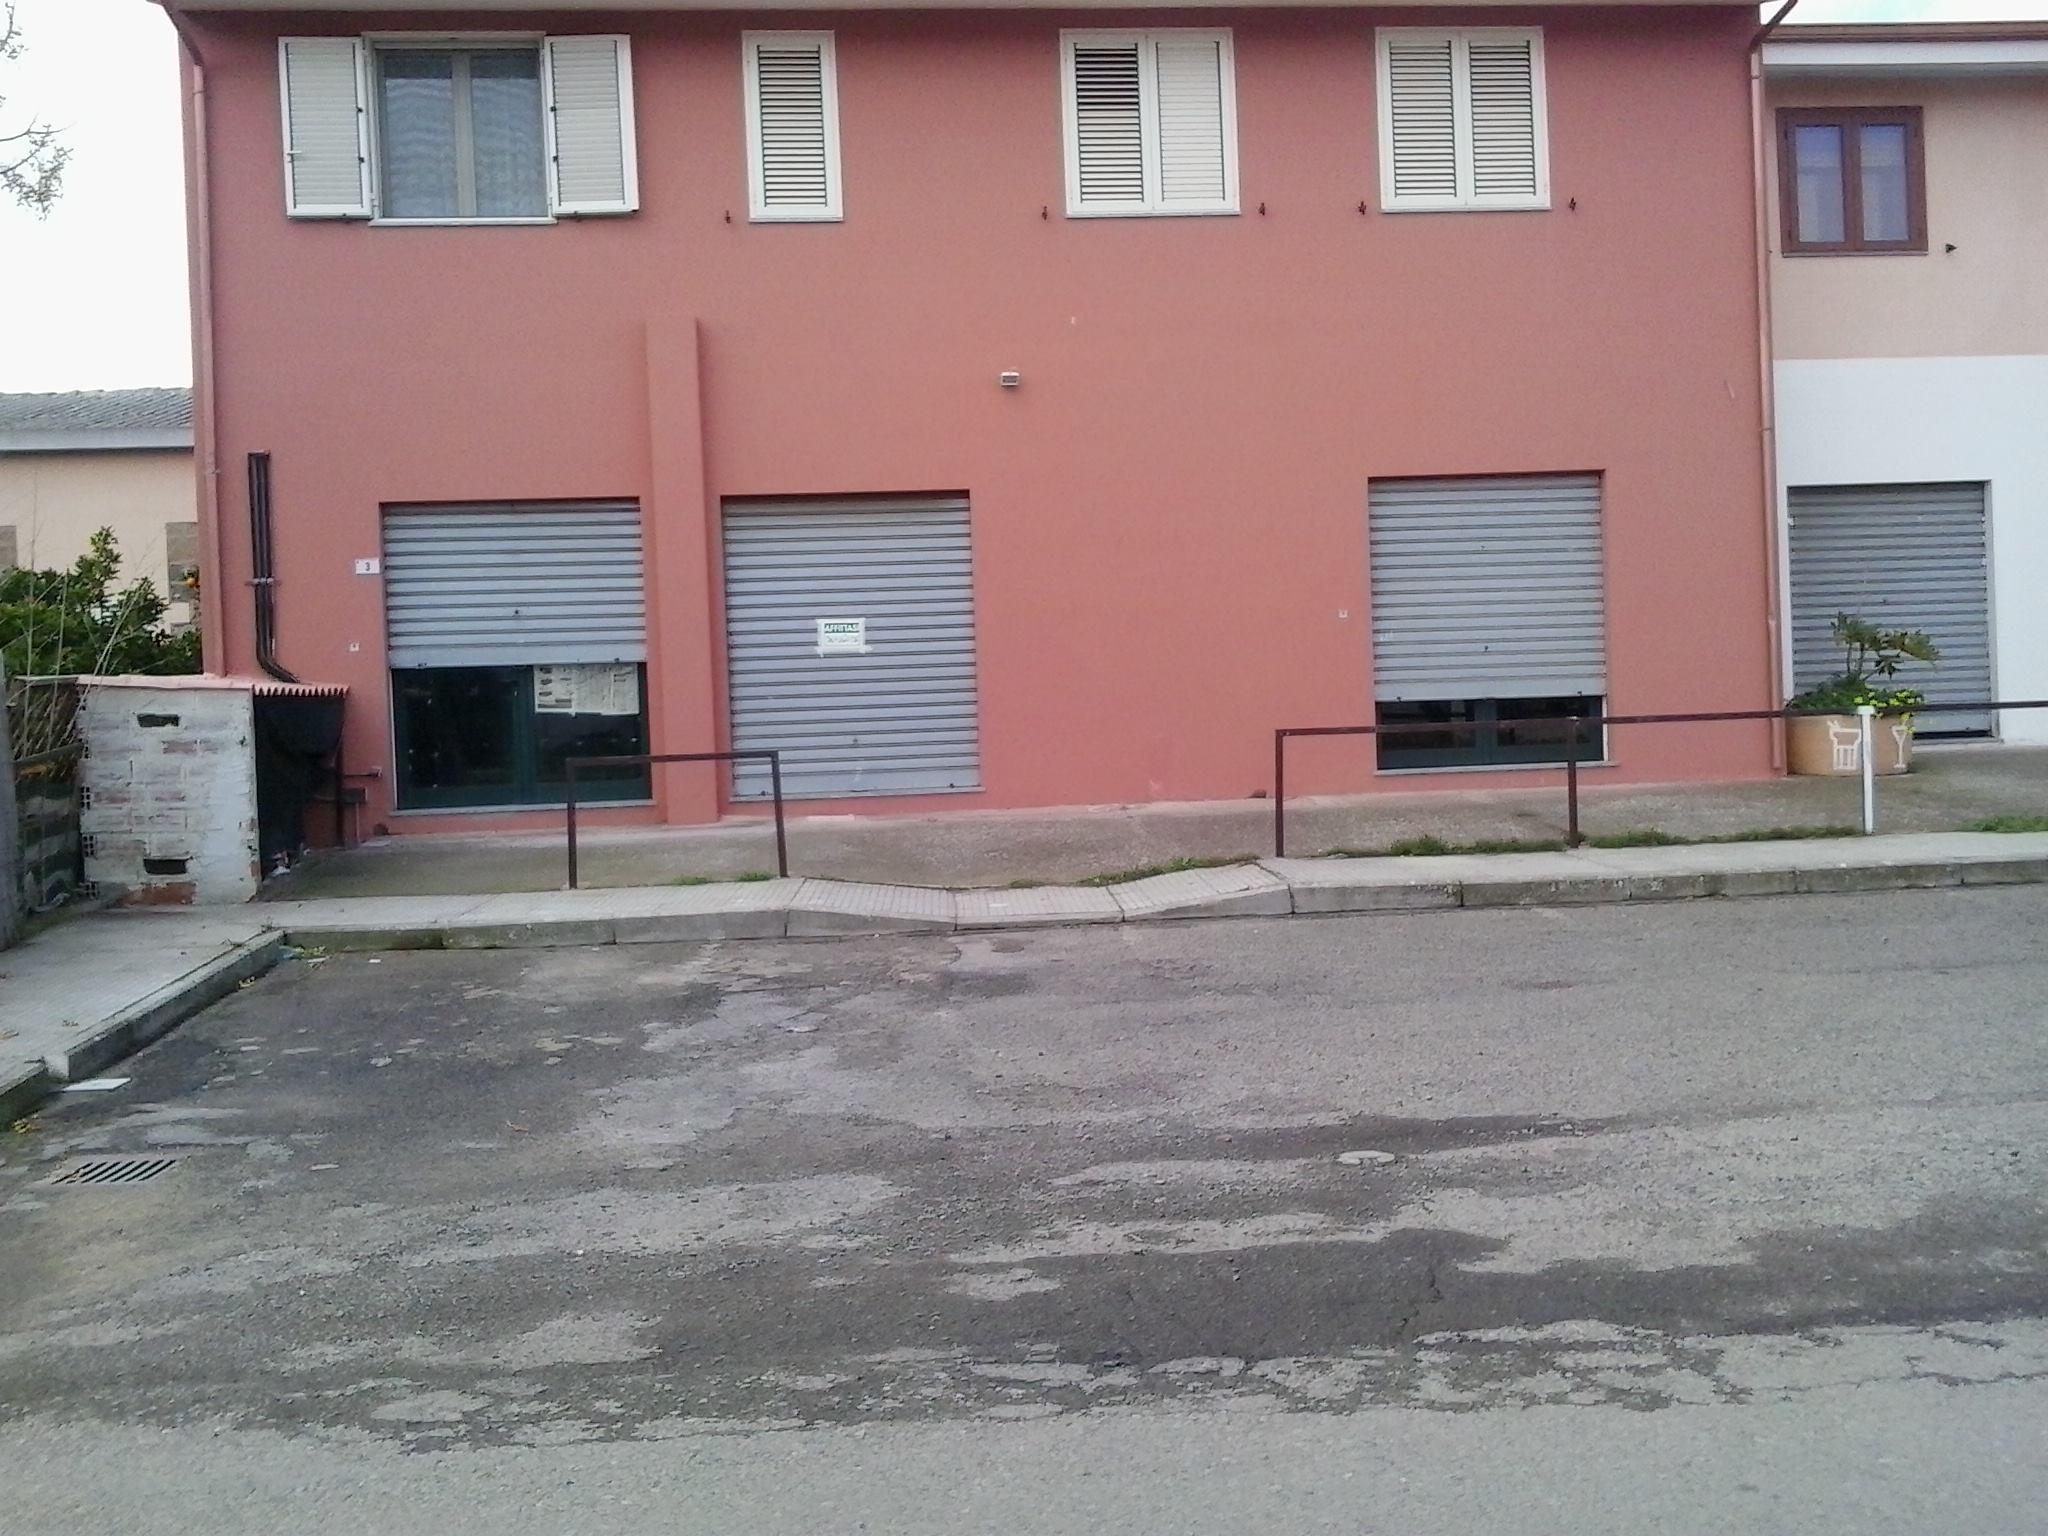 Ufficio Lavoro San Gavino : Annunci san gavino monreale net